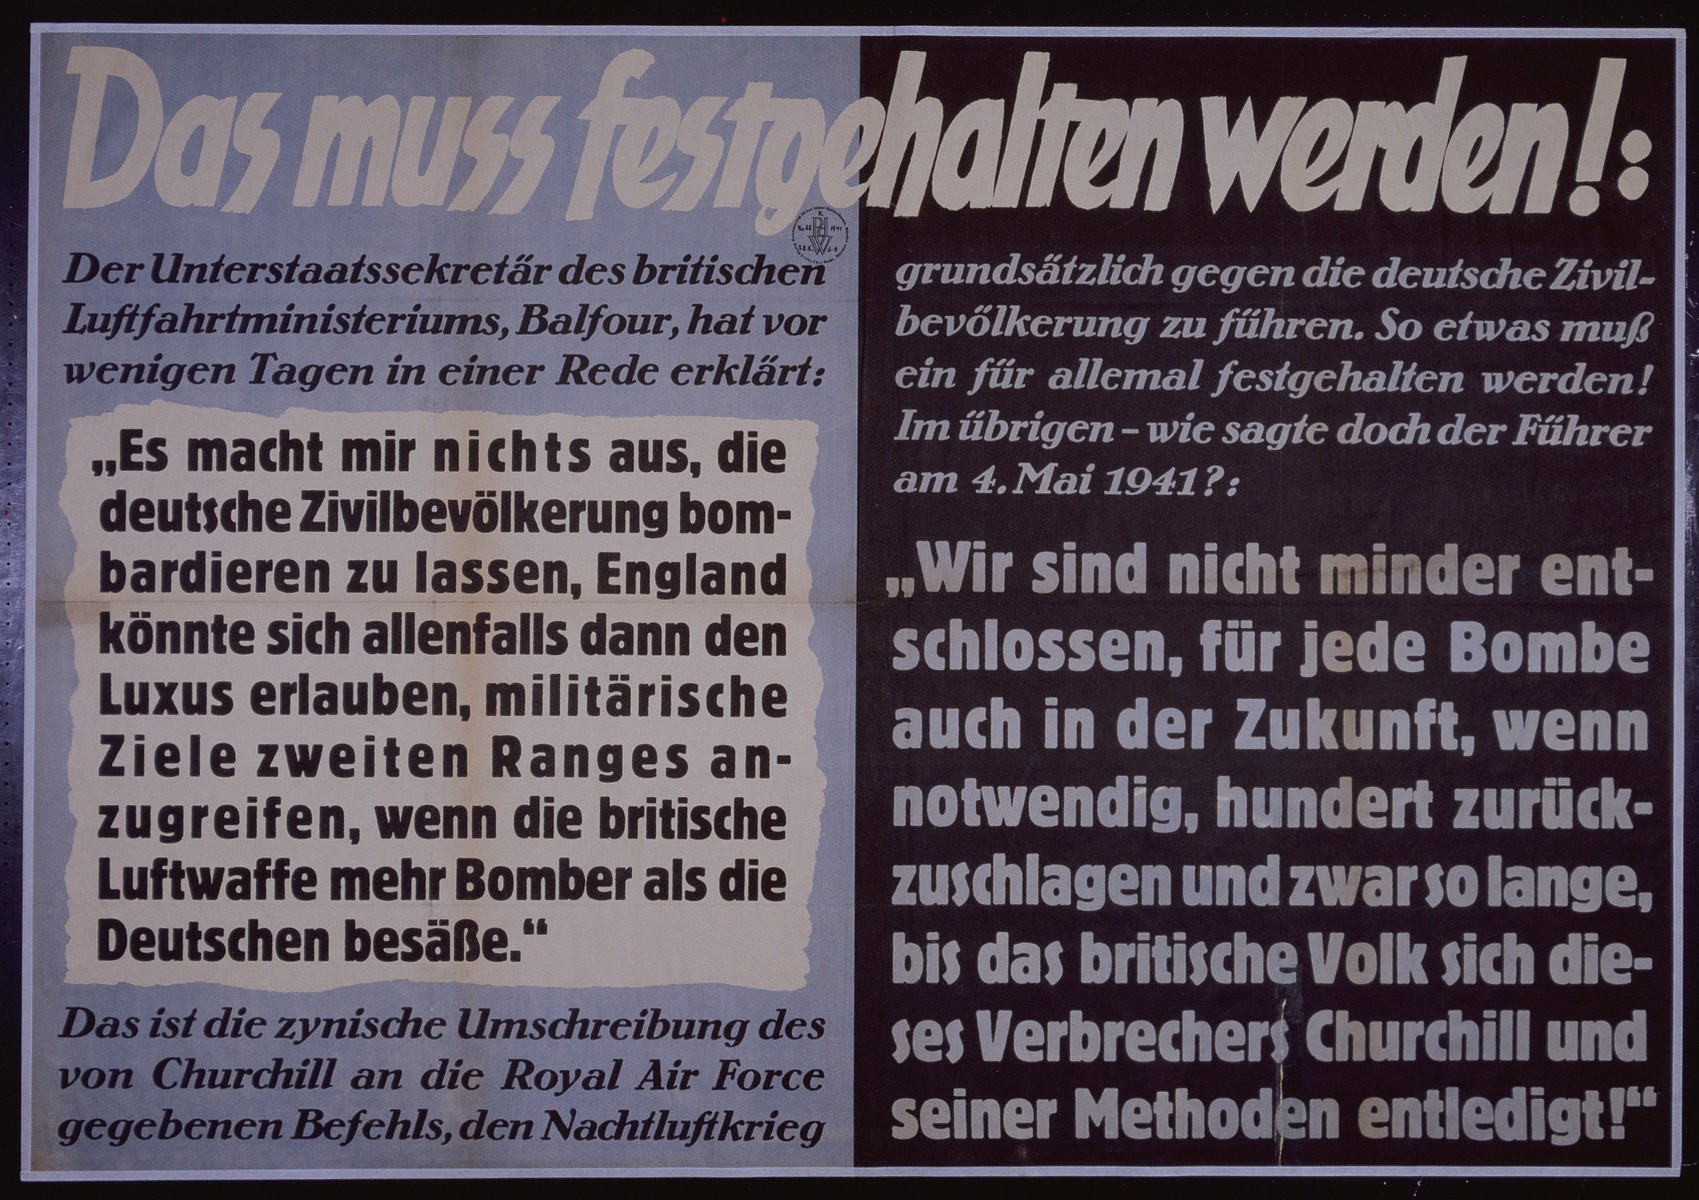 "Nazi propaganda poster entitled,""Das mub festgehalten werden!""  issued by the ""Parole der Woche,"" a wall newspaper (Wandzeitung) published by the National Socialist Party propaganda office in Munich."